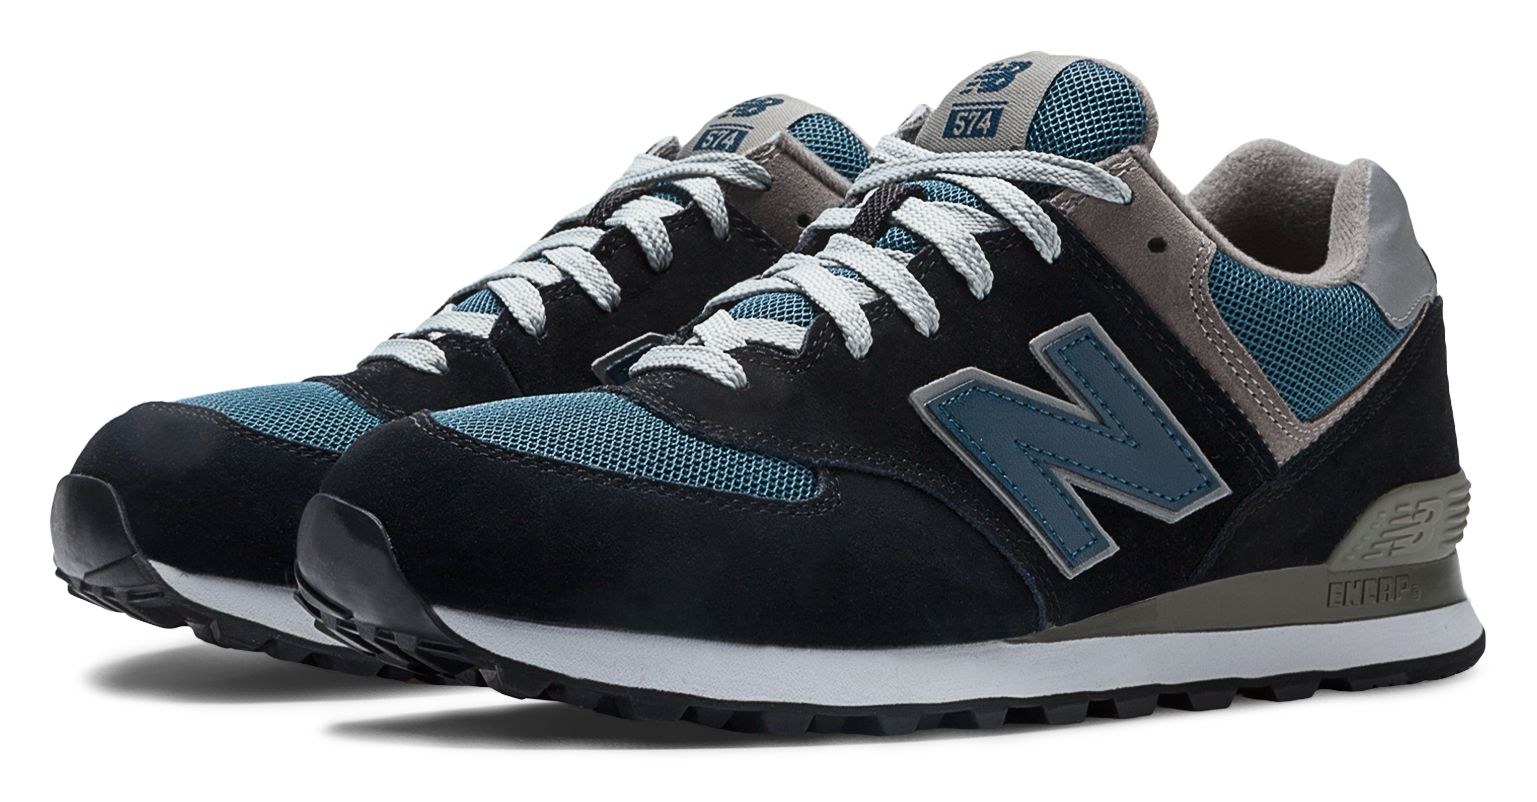 b0c6a59c25662 New Balance 247 Luxe Release Info | SneakerNews.com. Mens 574 Classics